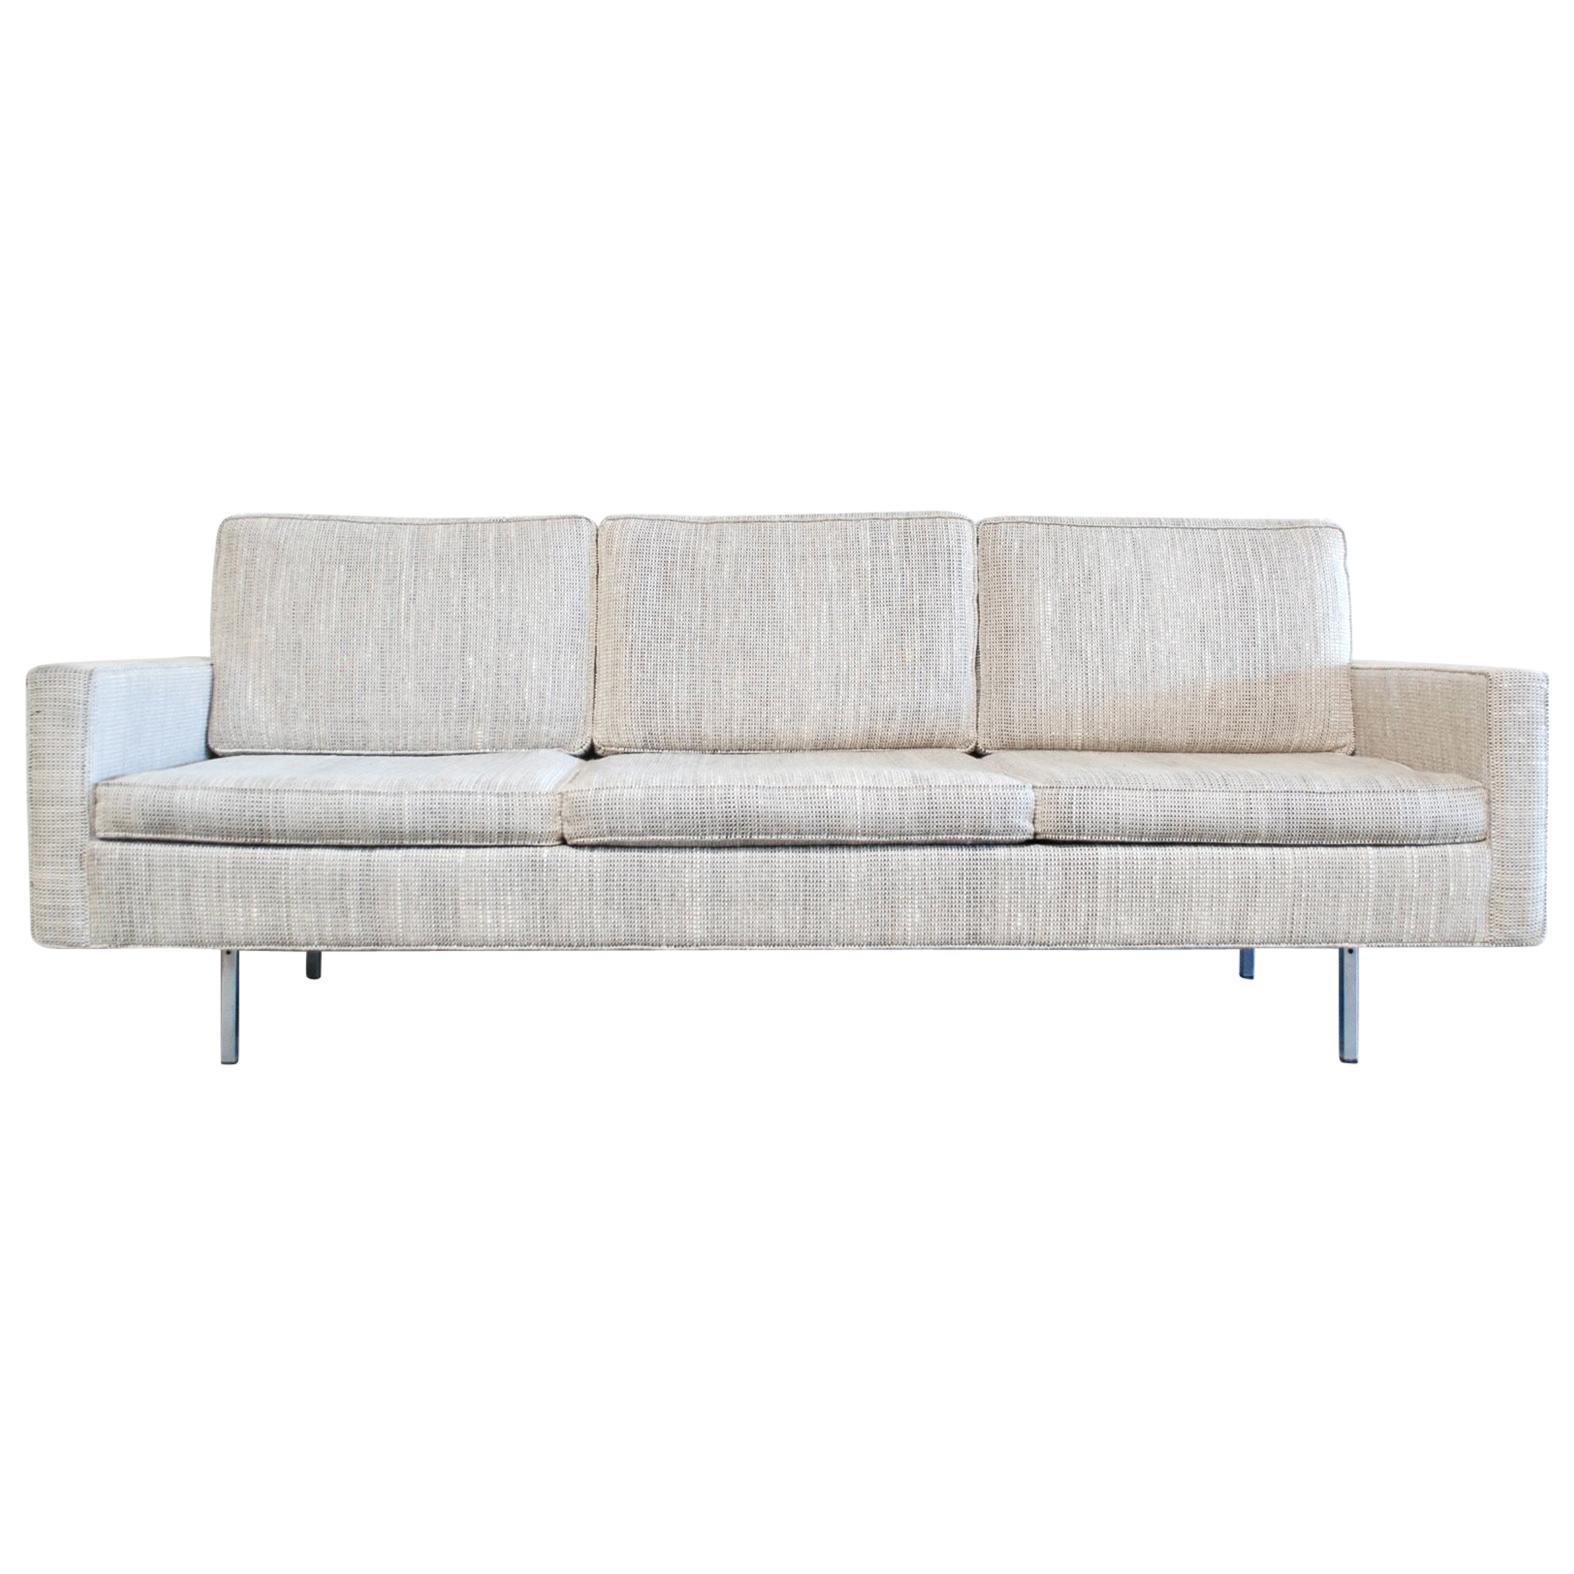 Florence Knoll International Sofa Model 25 BC